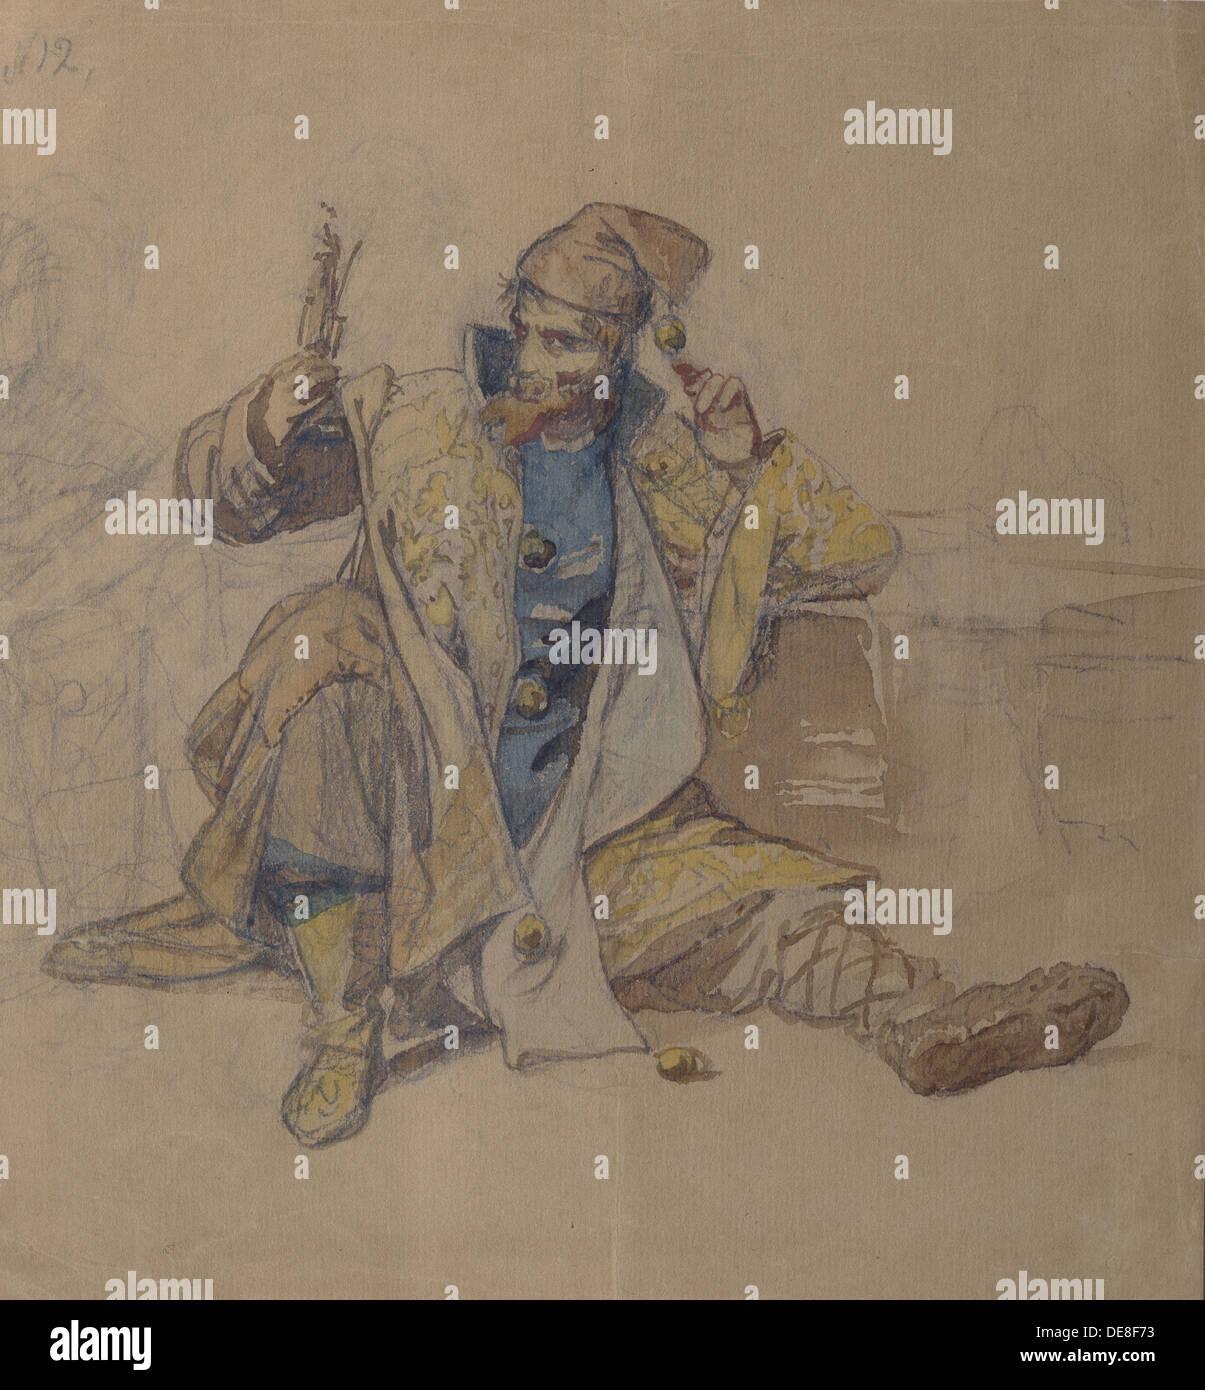 Jester of  Tsar Ivan the Terrible. Artist: Litovchenko, Alexander Dmitrievich (1835-1890) - Stock Image